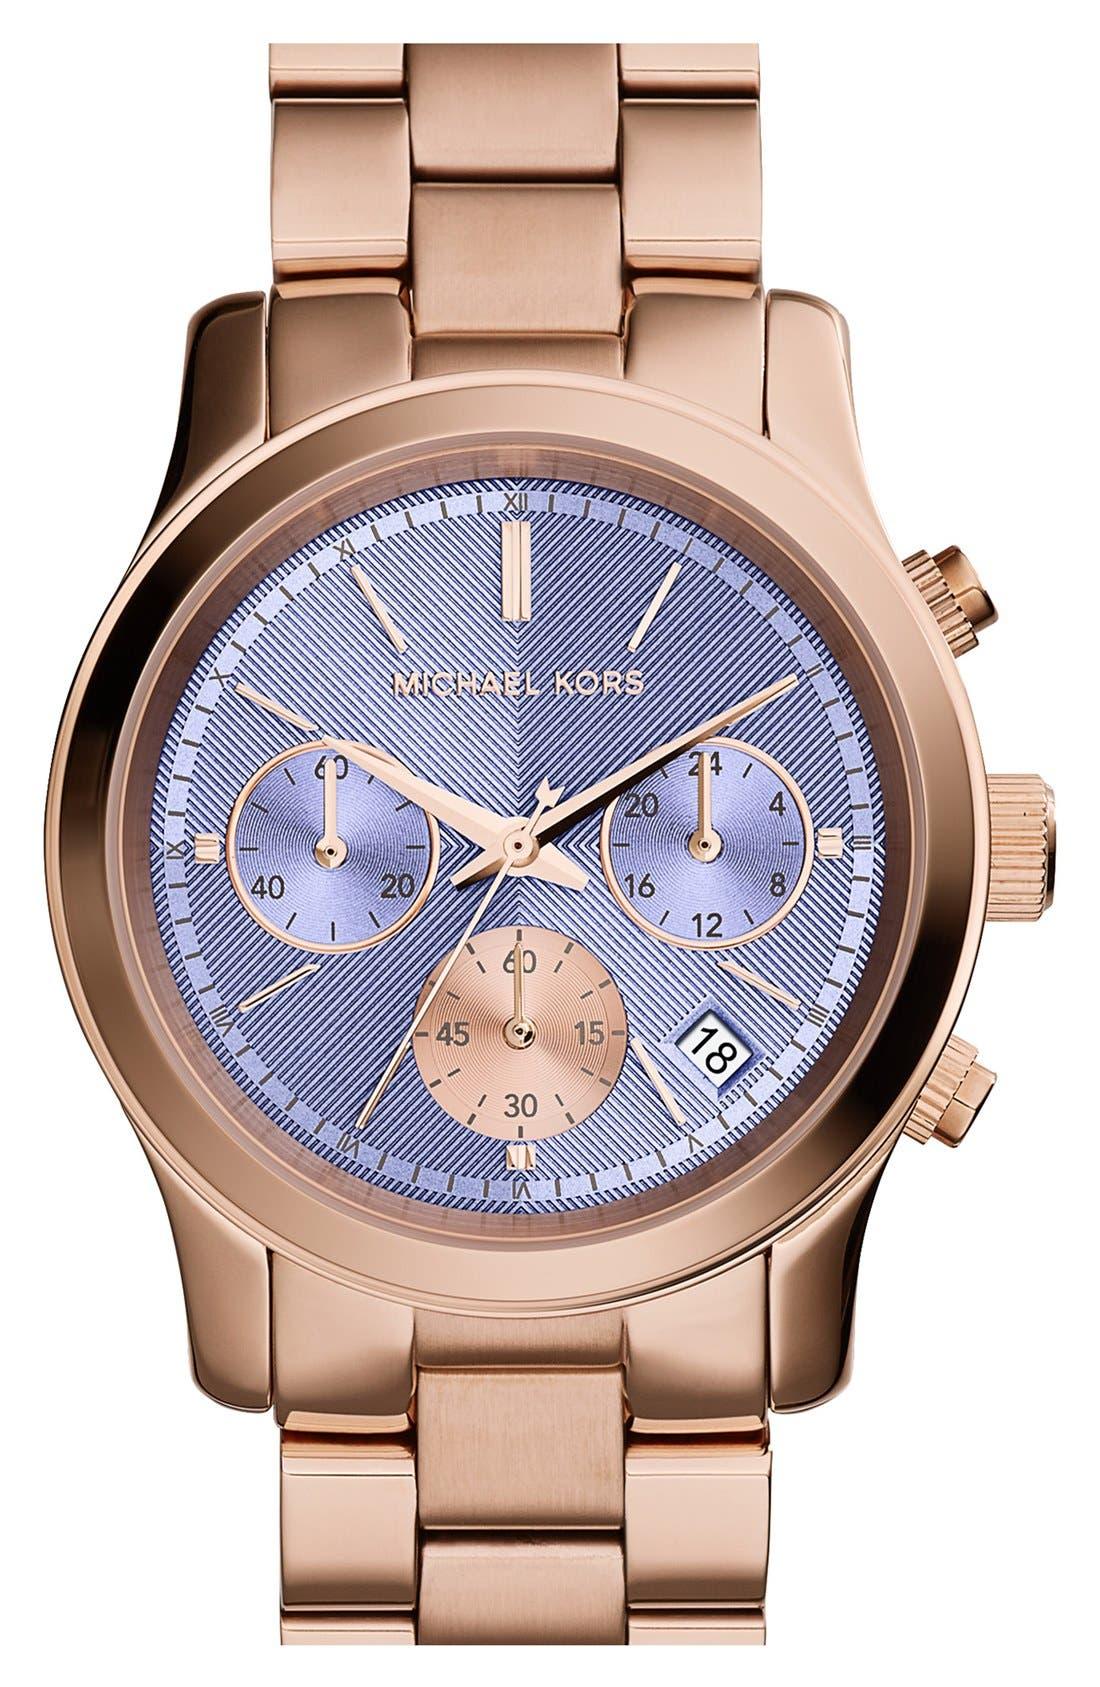 Alternate Image 1 Selected - Michael Kors 'Runway' Chronograph Watch, 38mm